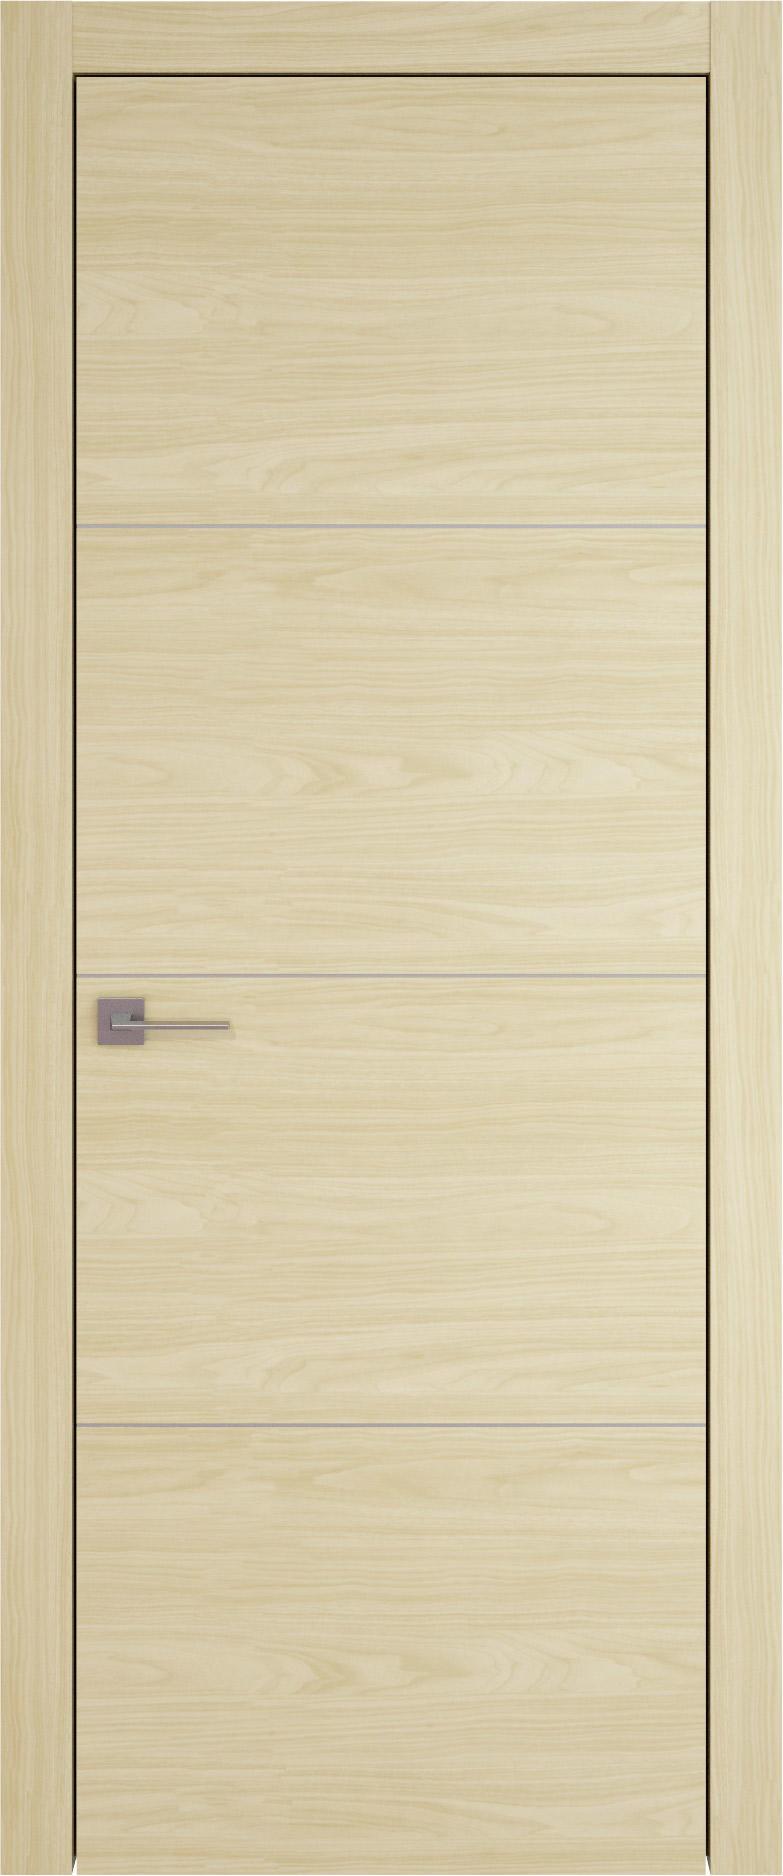 Tivoli Г-3 цвет - Дуб нордик Без стекла (ДГ)